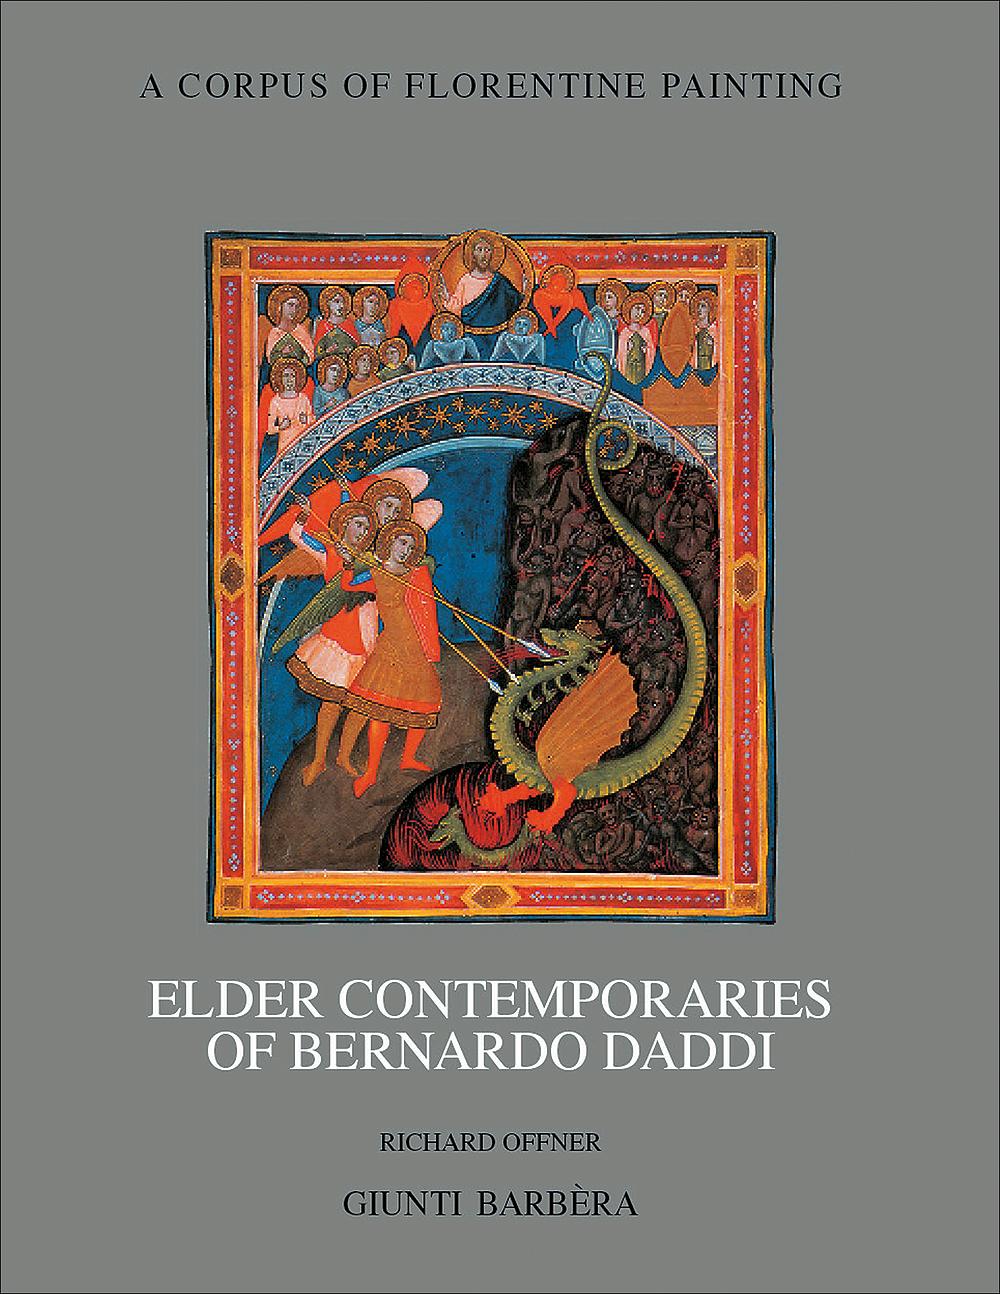 Elder contemporaries of Bernardo Daddi